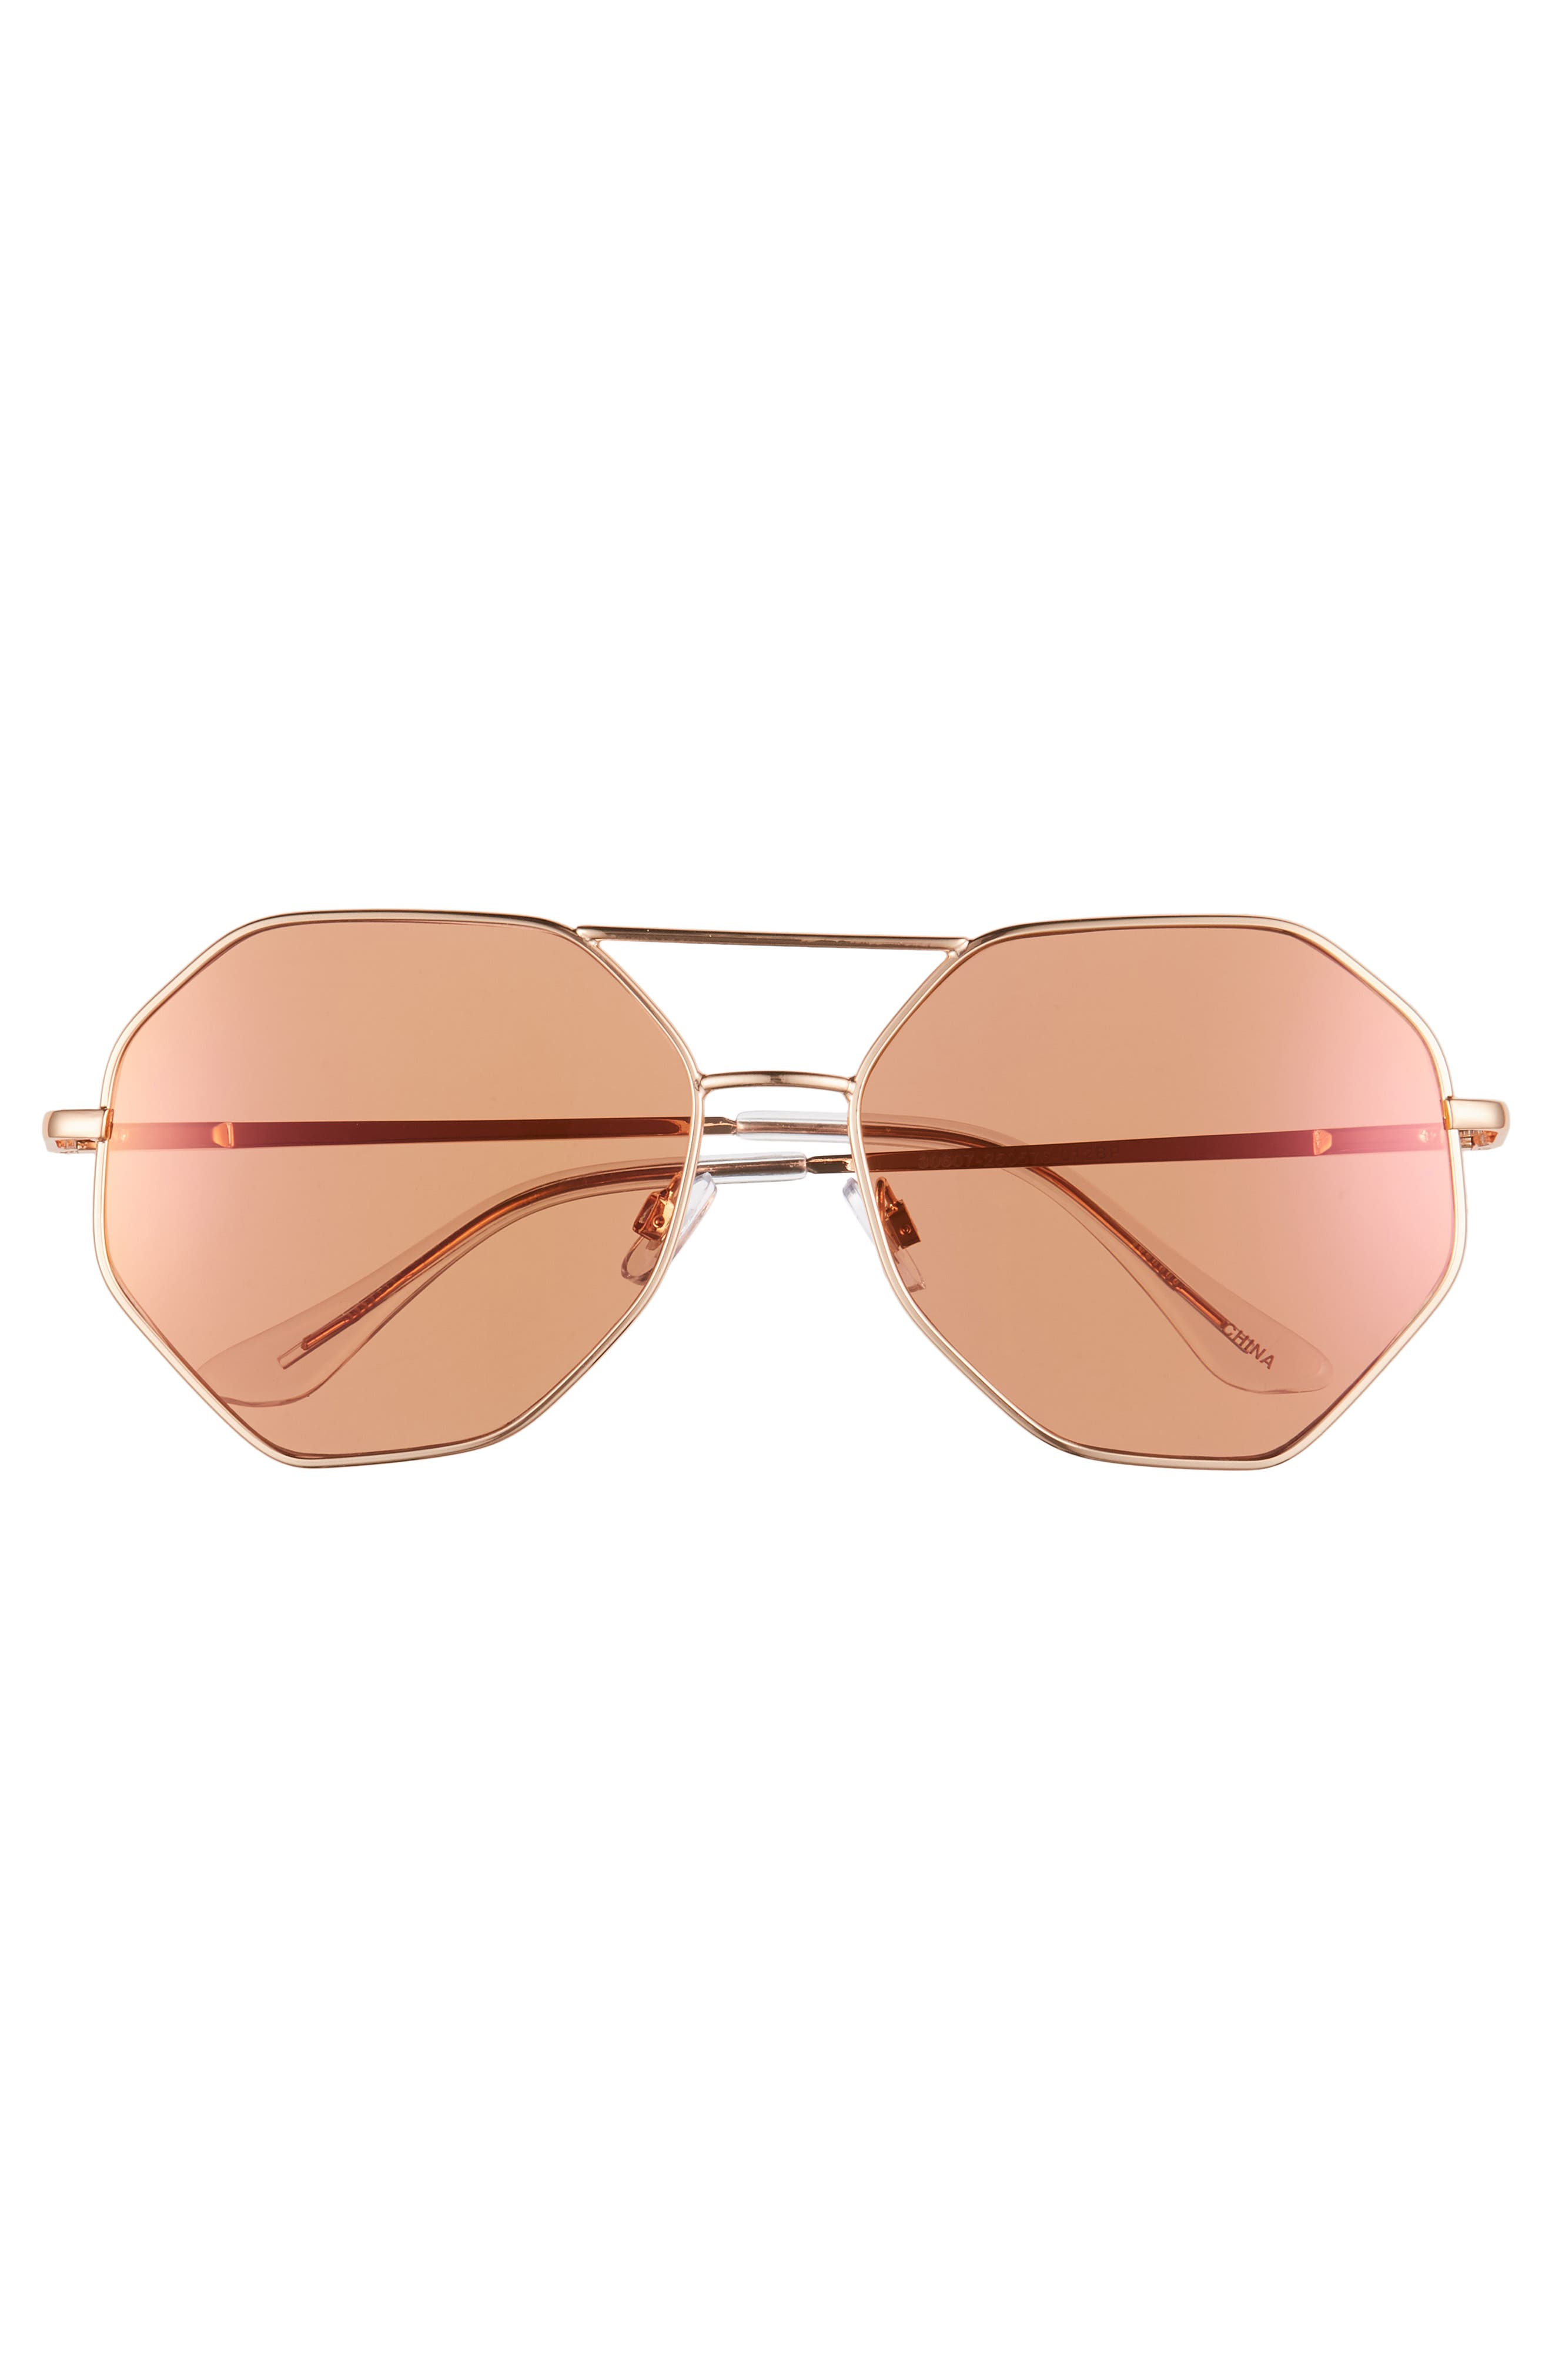 Hexcon Aviator Sunglasses,                             Alternate thumbnail 3, color,                             710